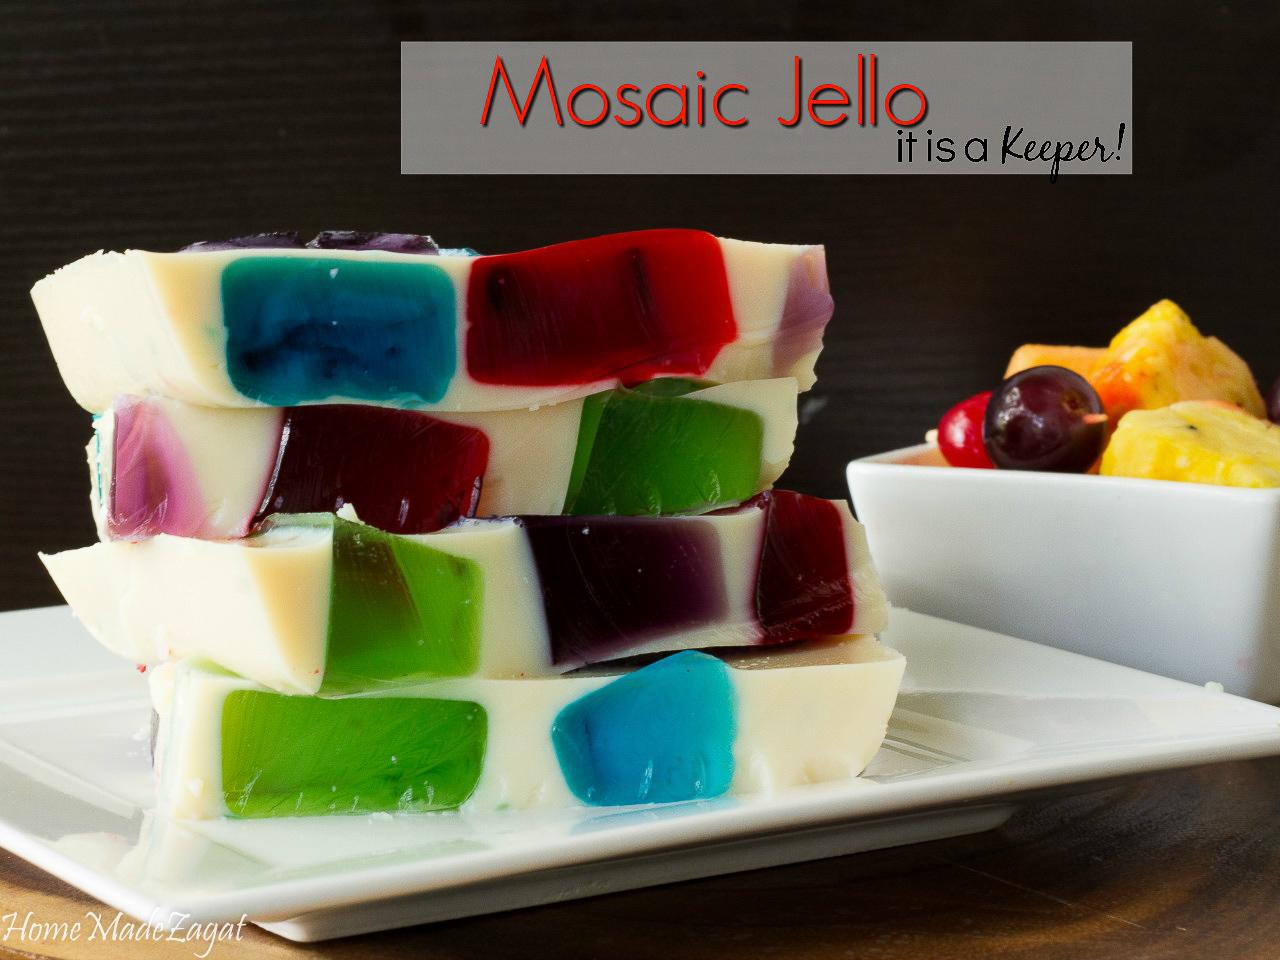 Mosaic-Jello-Content